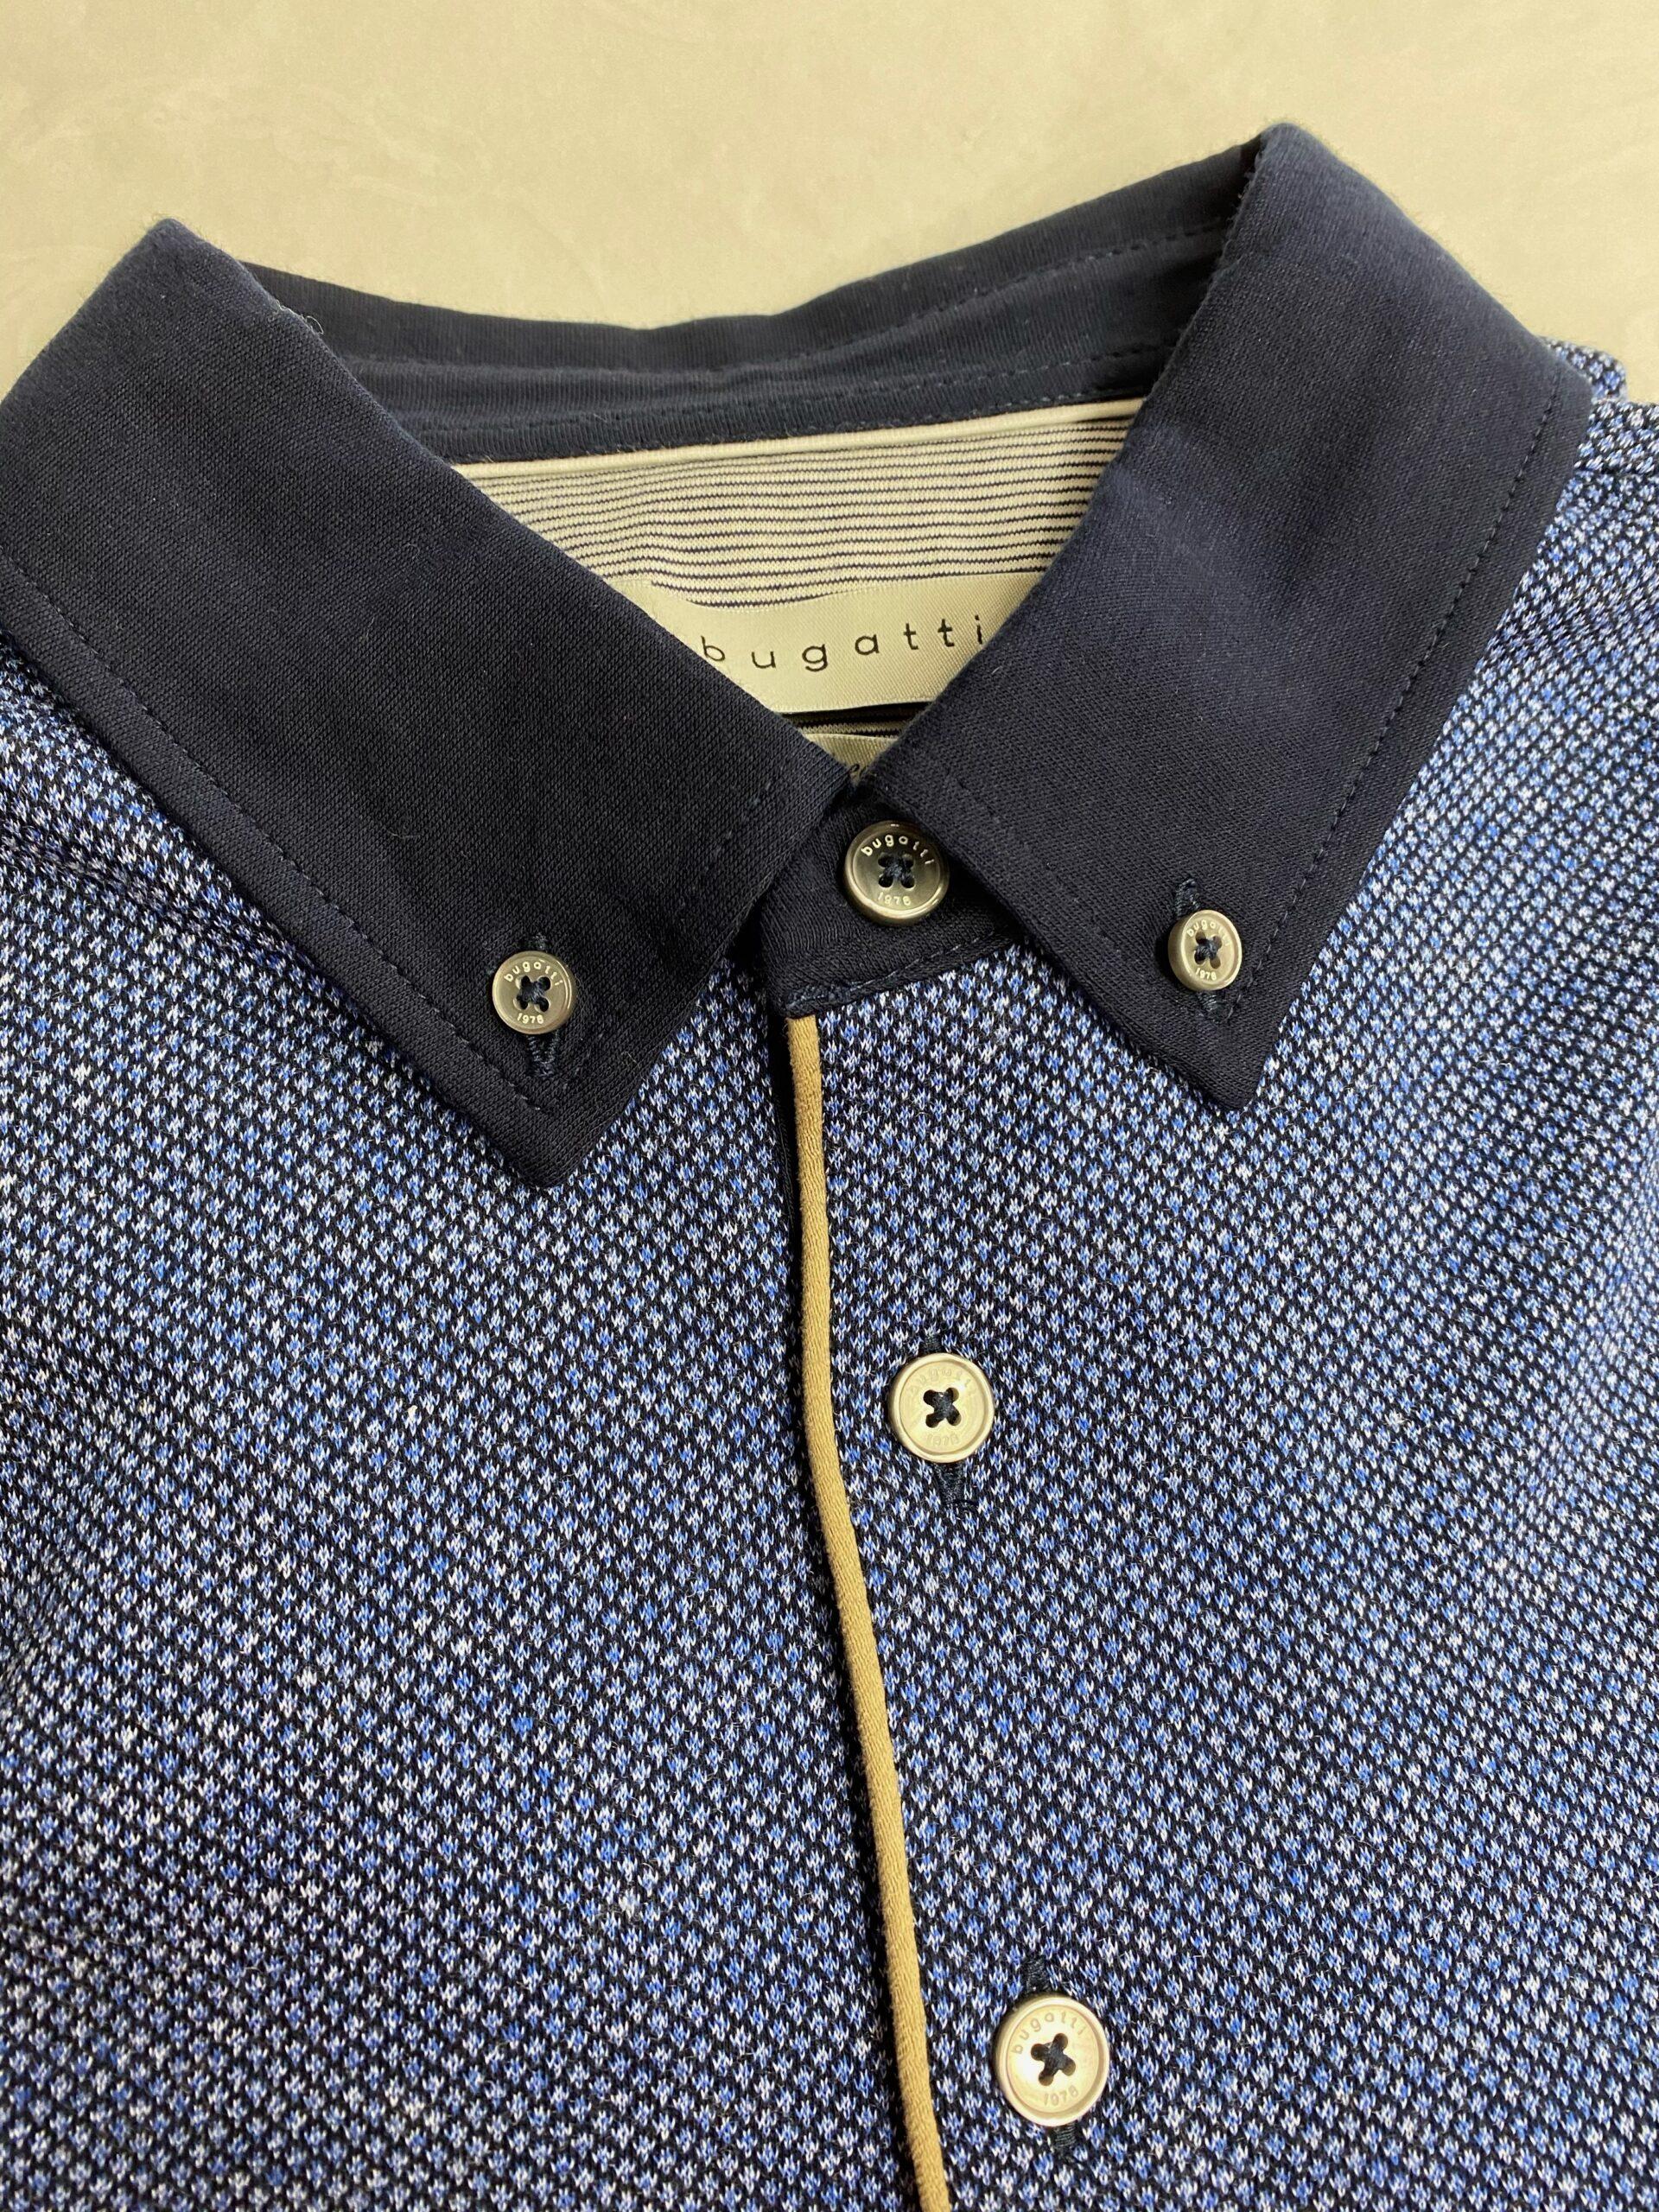 Bugatti| Premium Finish Polo Shirt Blue & Navy